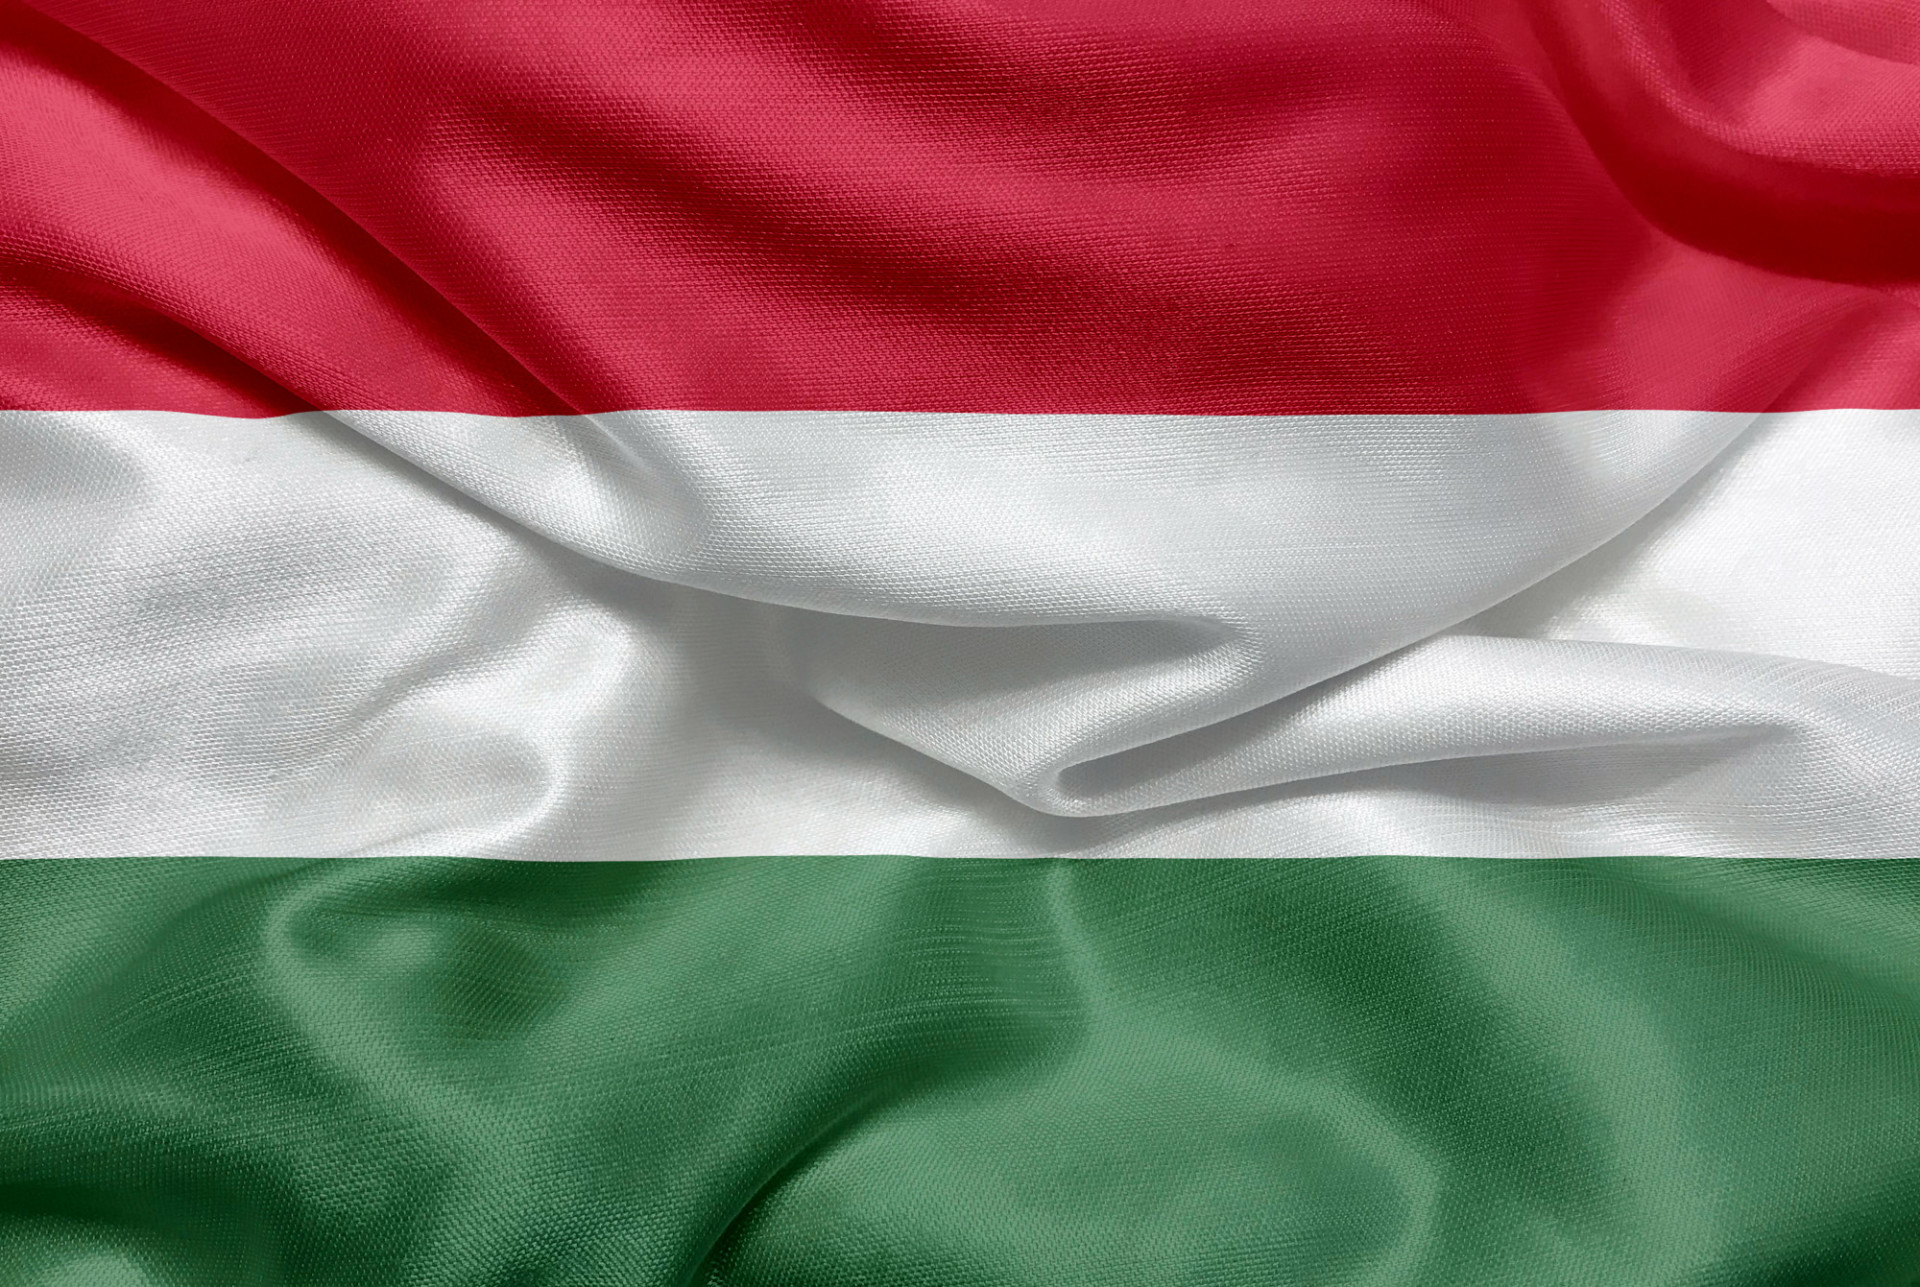 Variant flag of Hungary